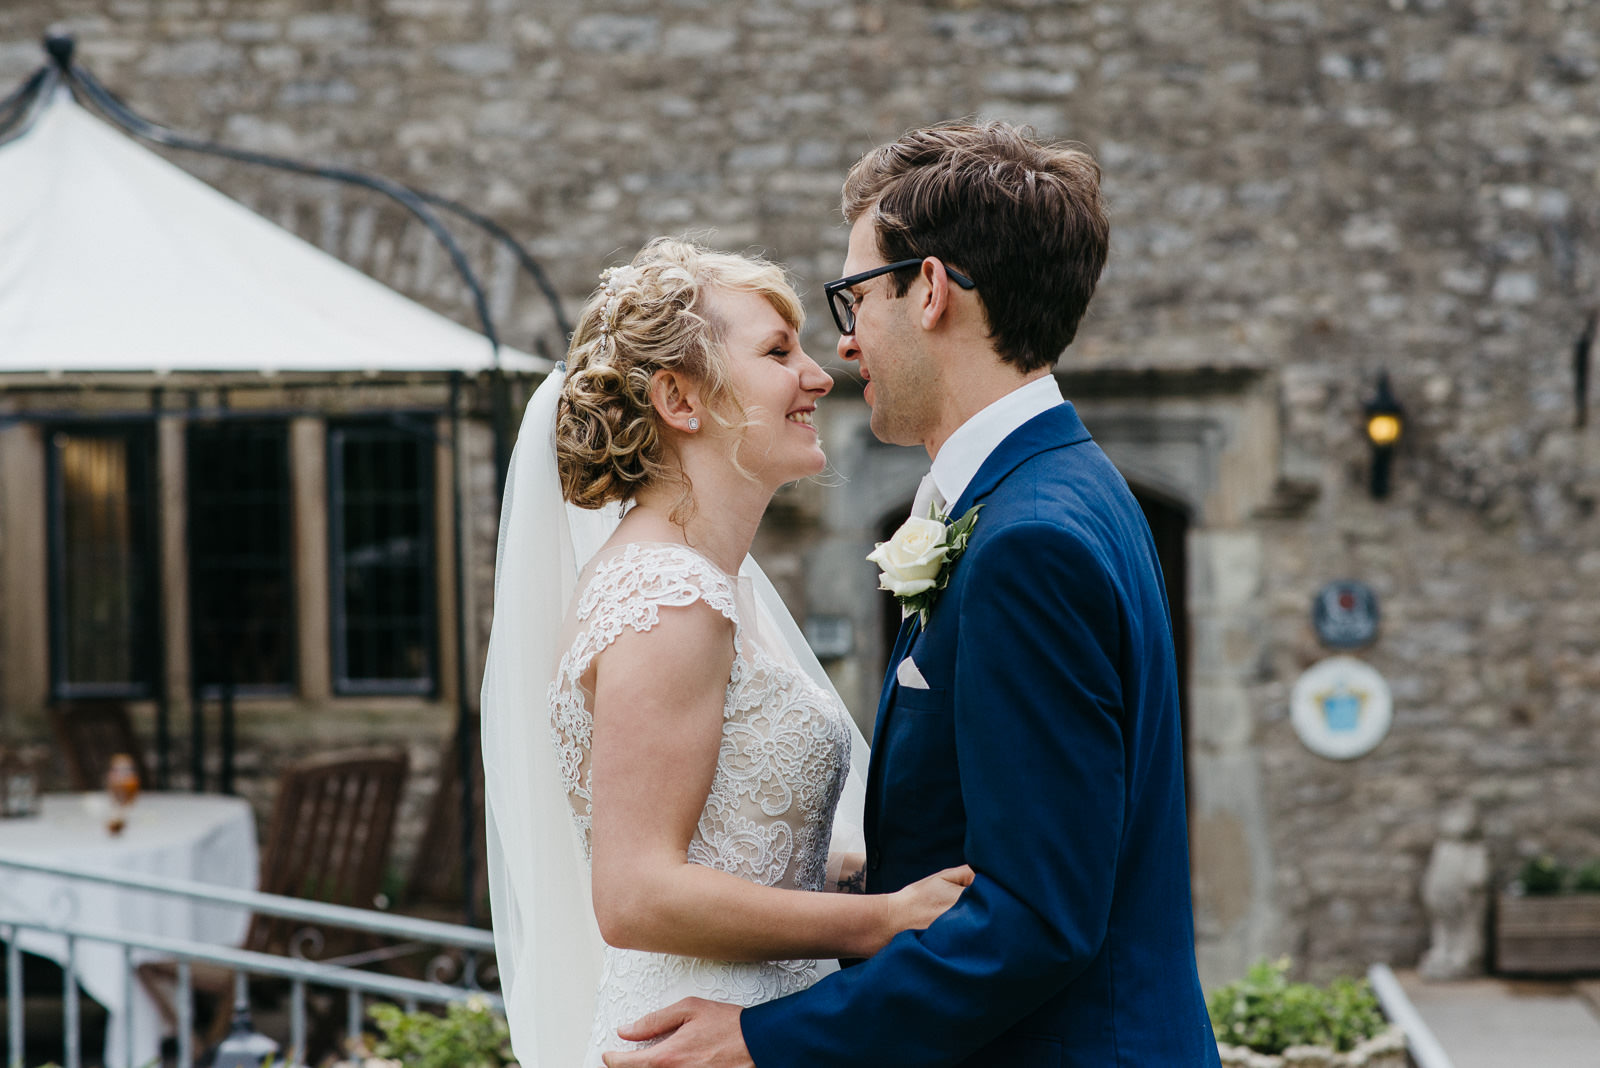 Creative wedding photographer Cardiff // Elaine Williams Photography